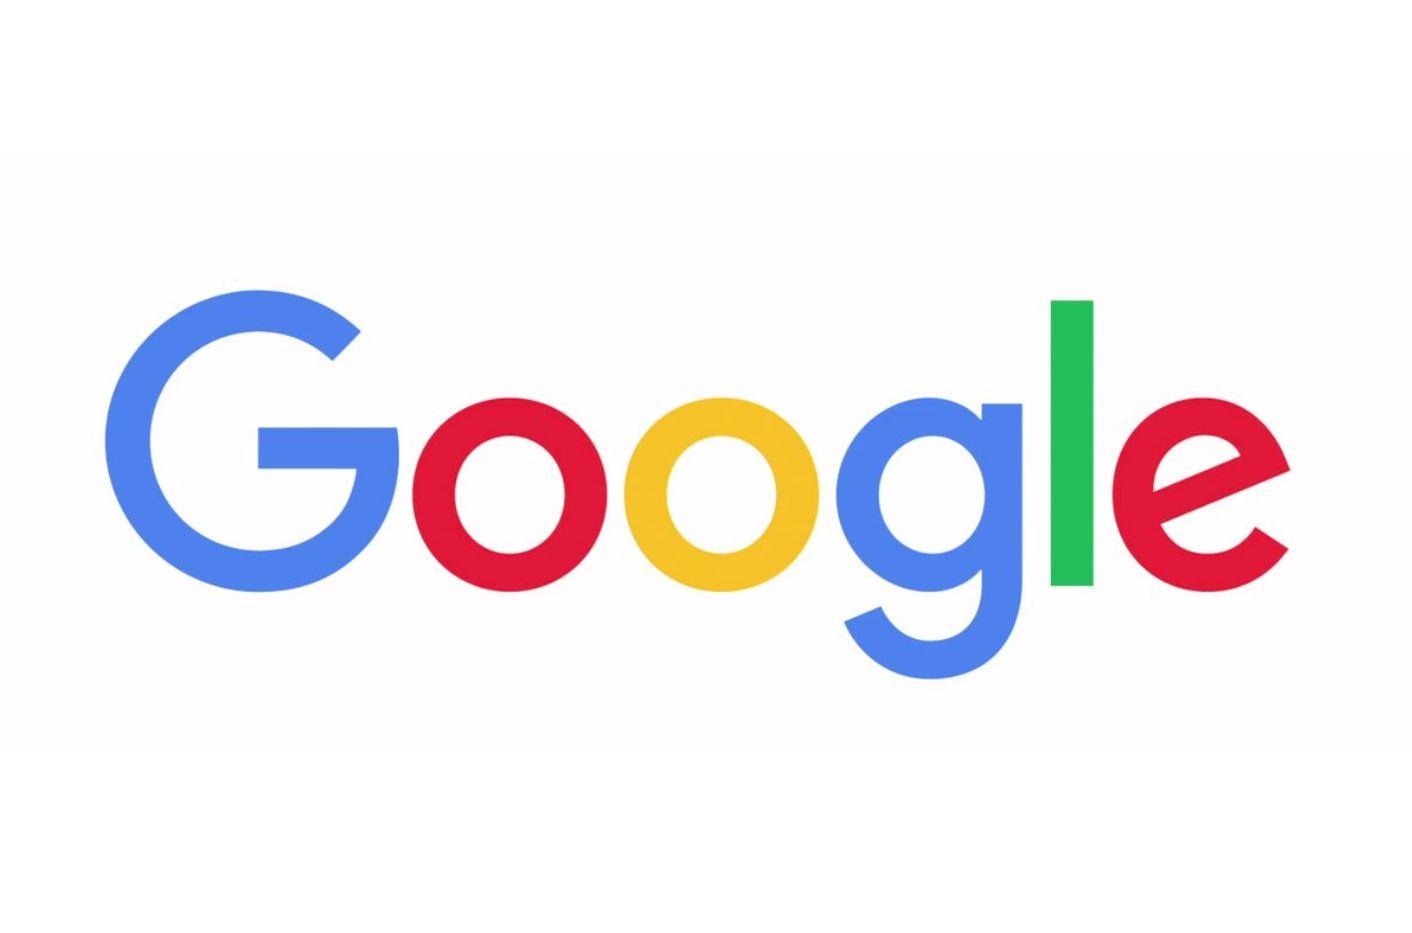 Website truy cập nhiều nhất Google